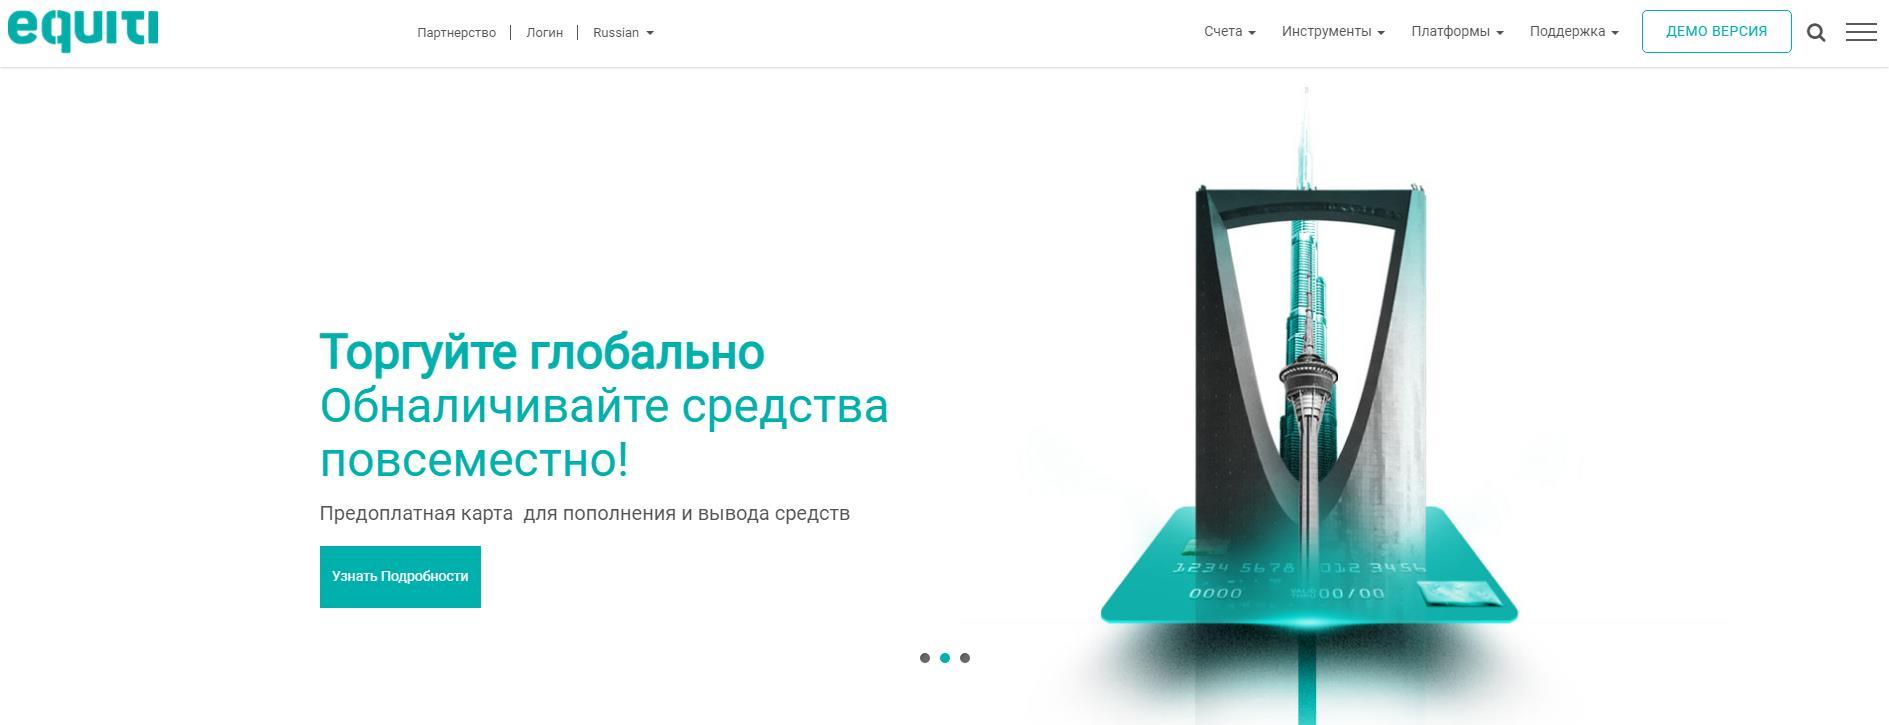 официальный сайт equiti group